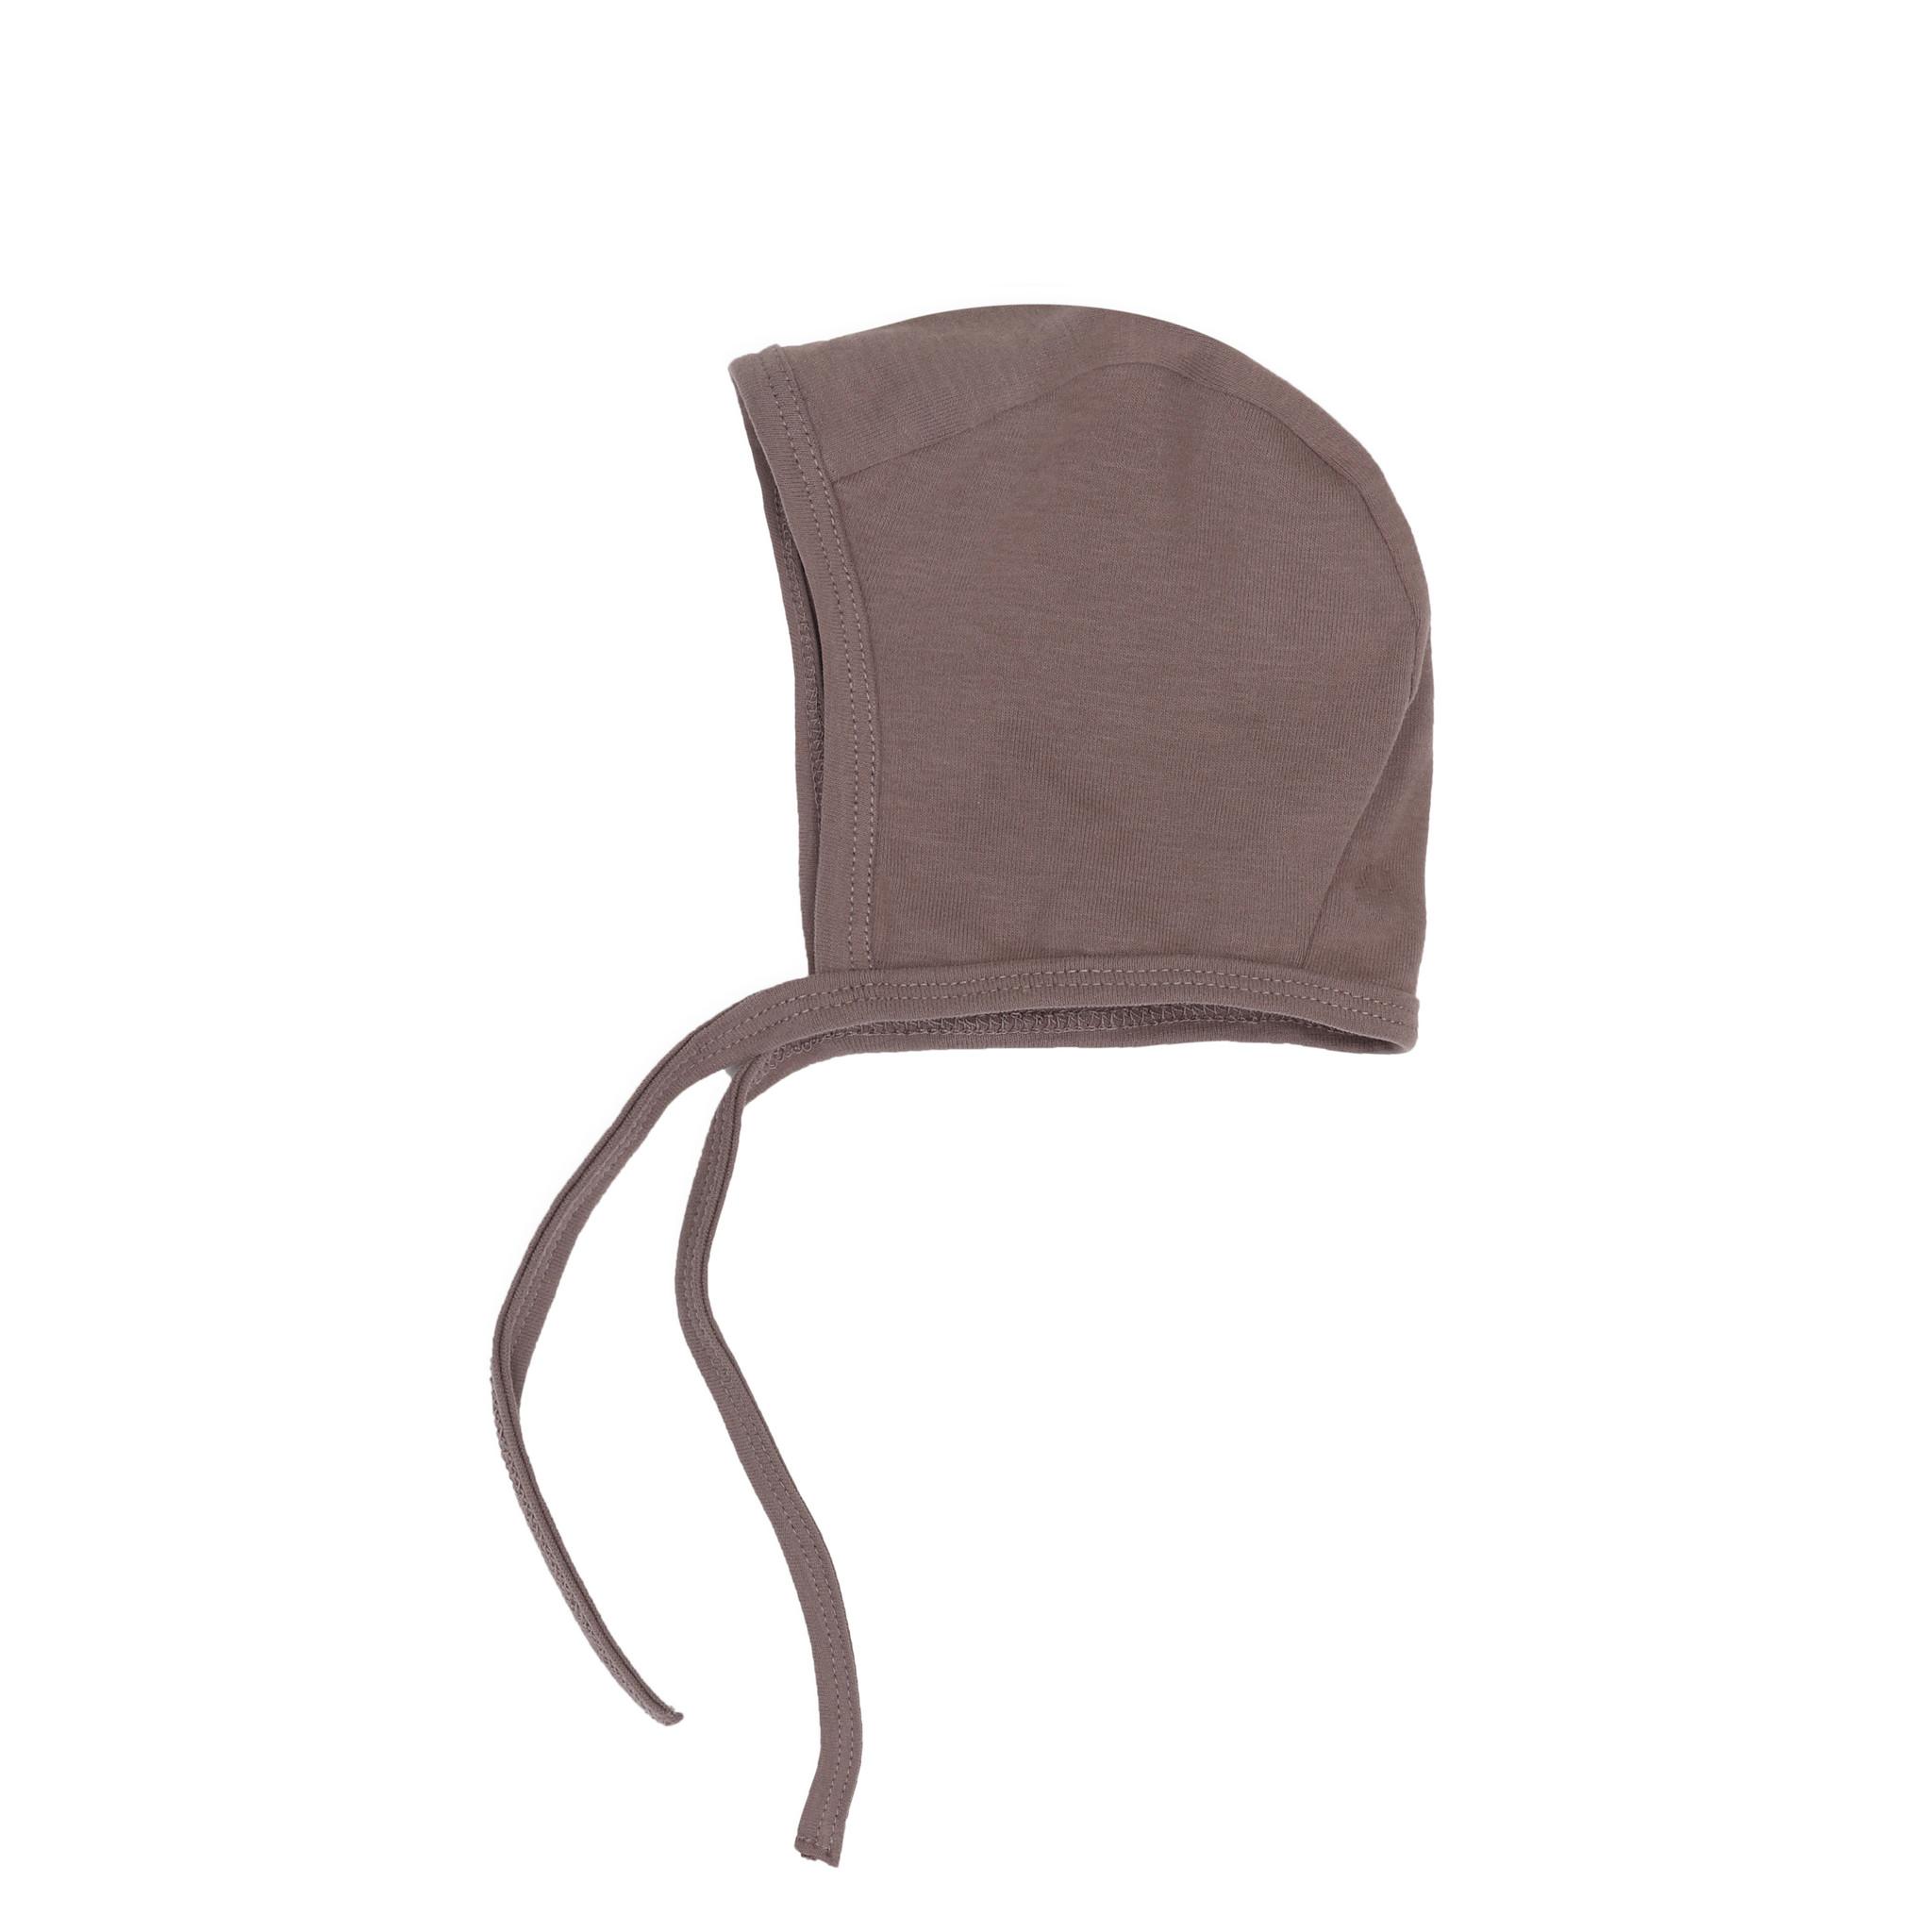 Baby bonnet - heather-1